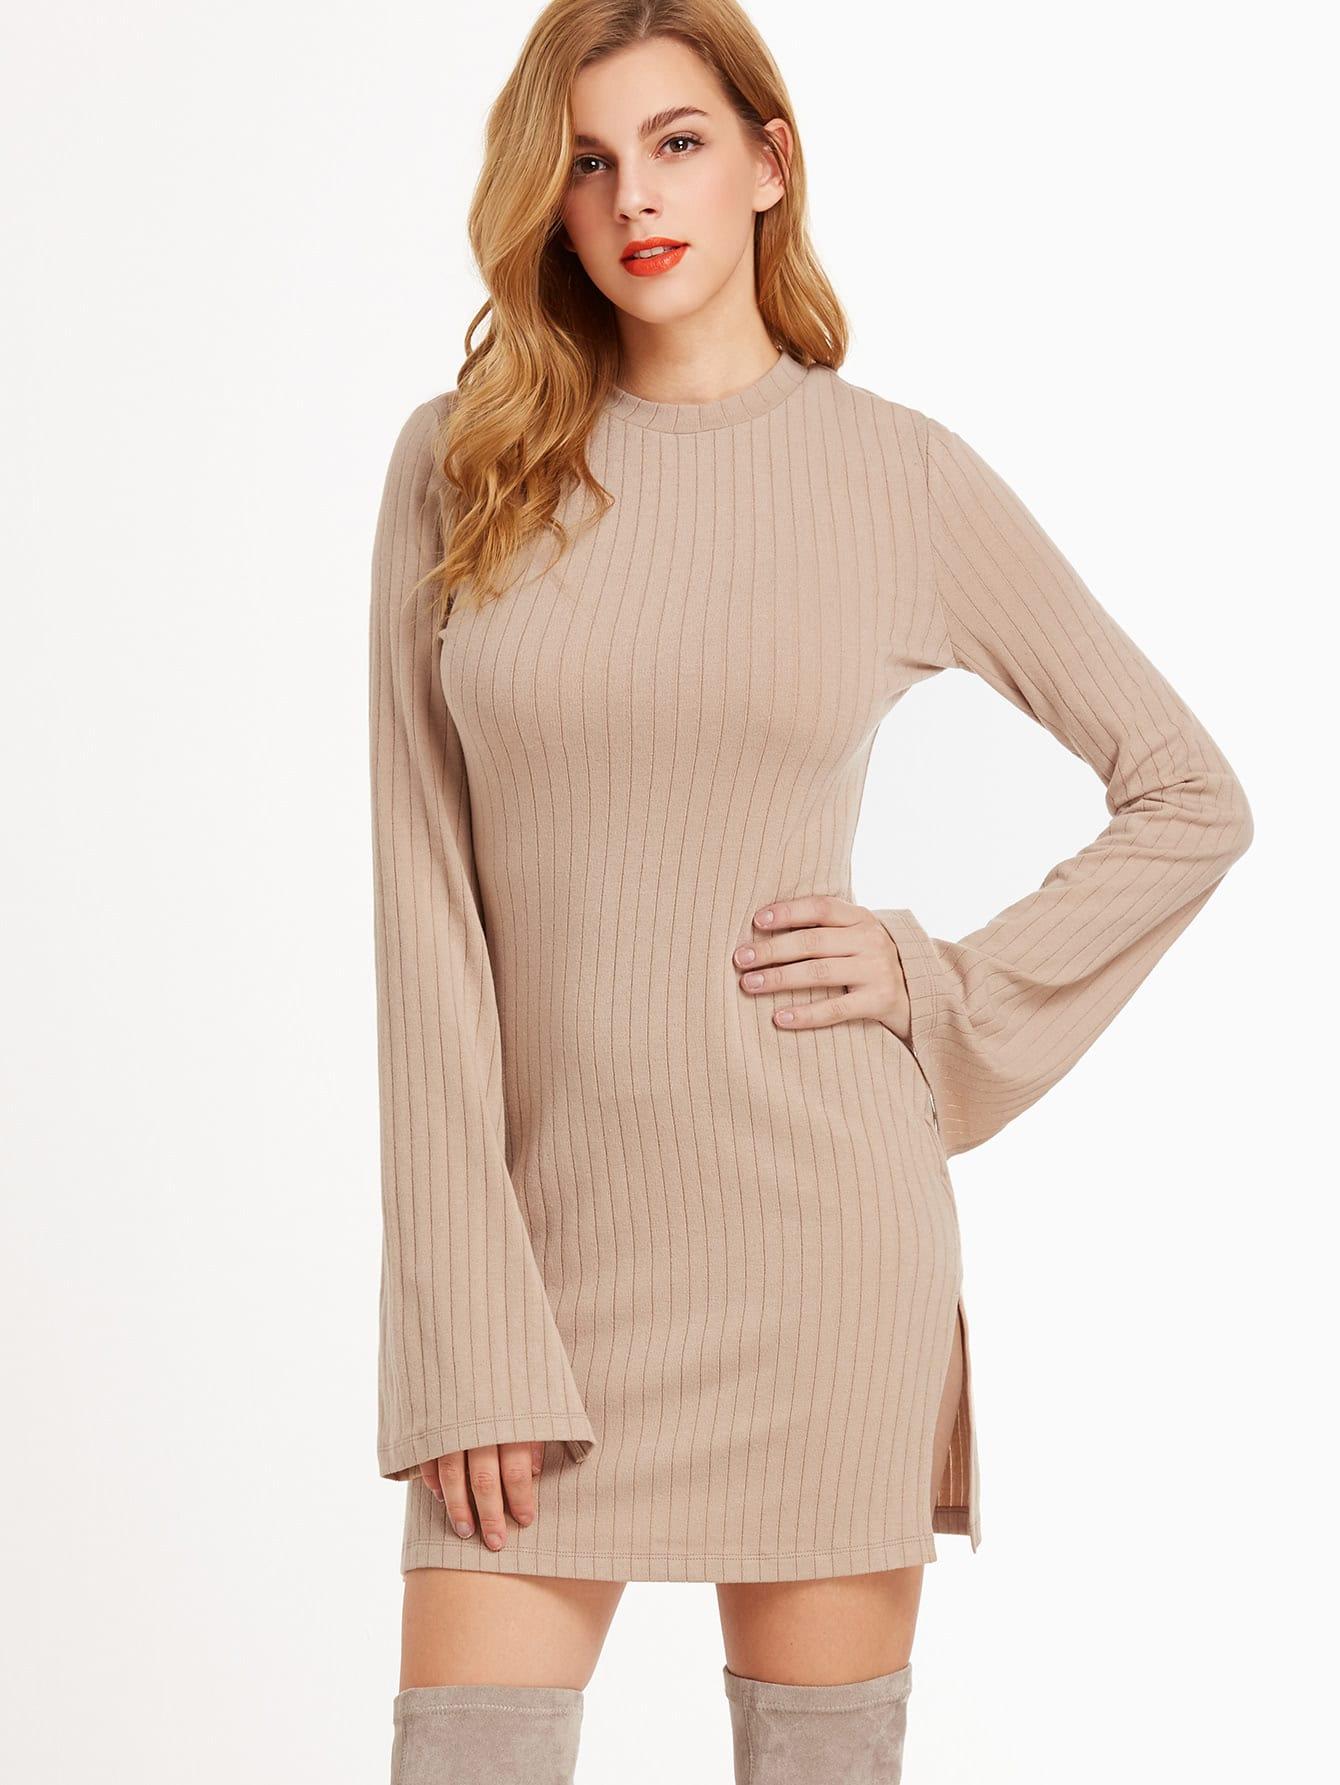 Camel Ribbed Knit Bell Sleeve Split Side Dress dress161116705